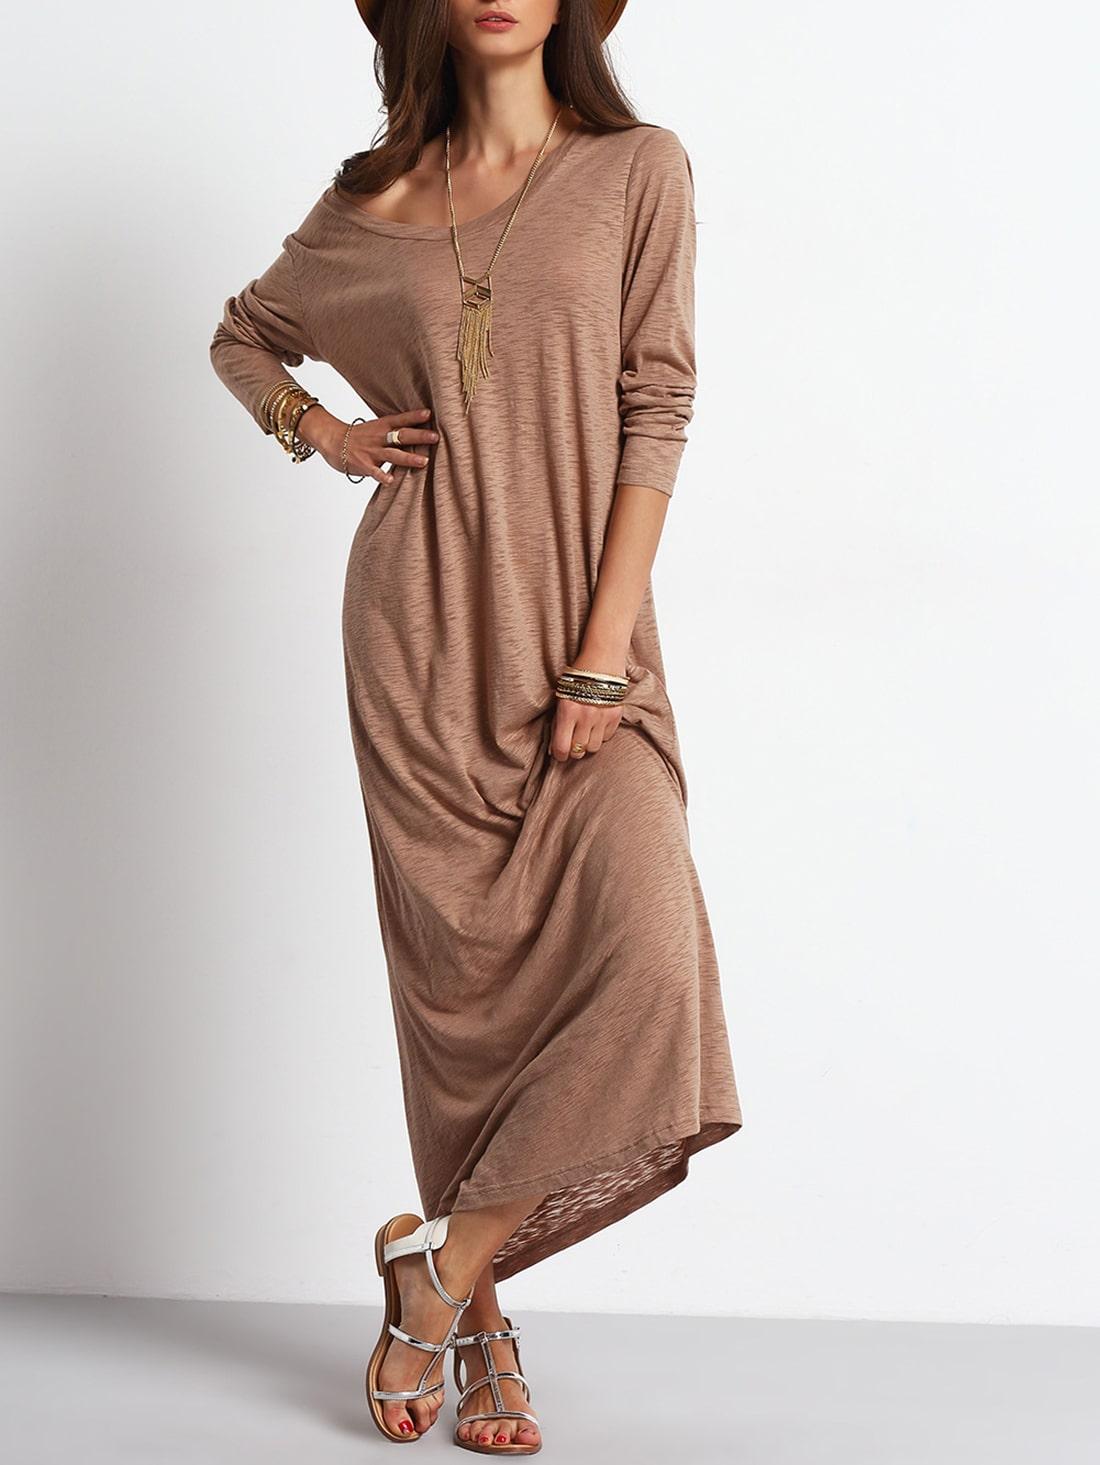 Apricot Scoop Neck Casual Maxi Dress -SheIn(Sheinside)